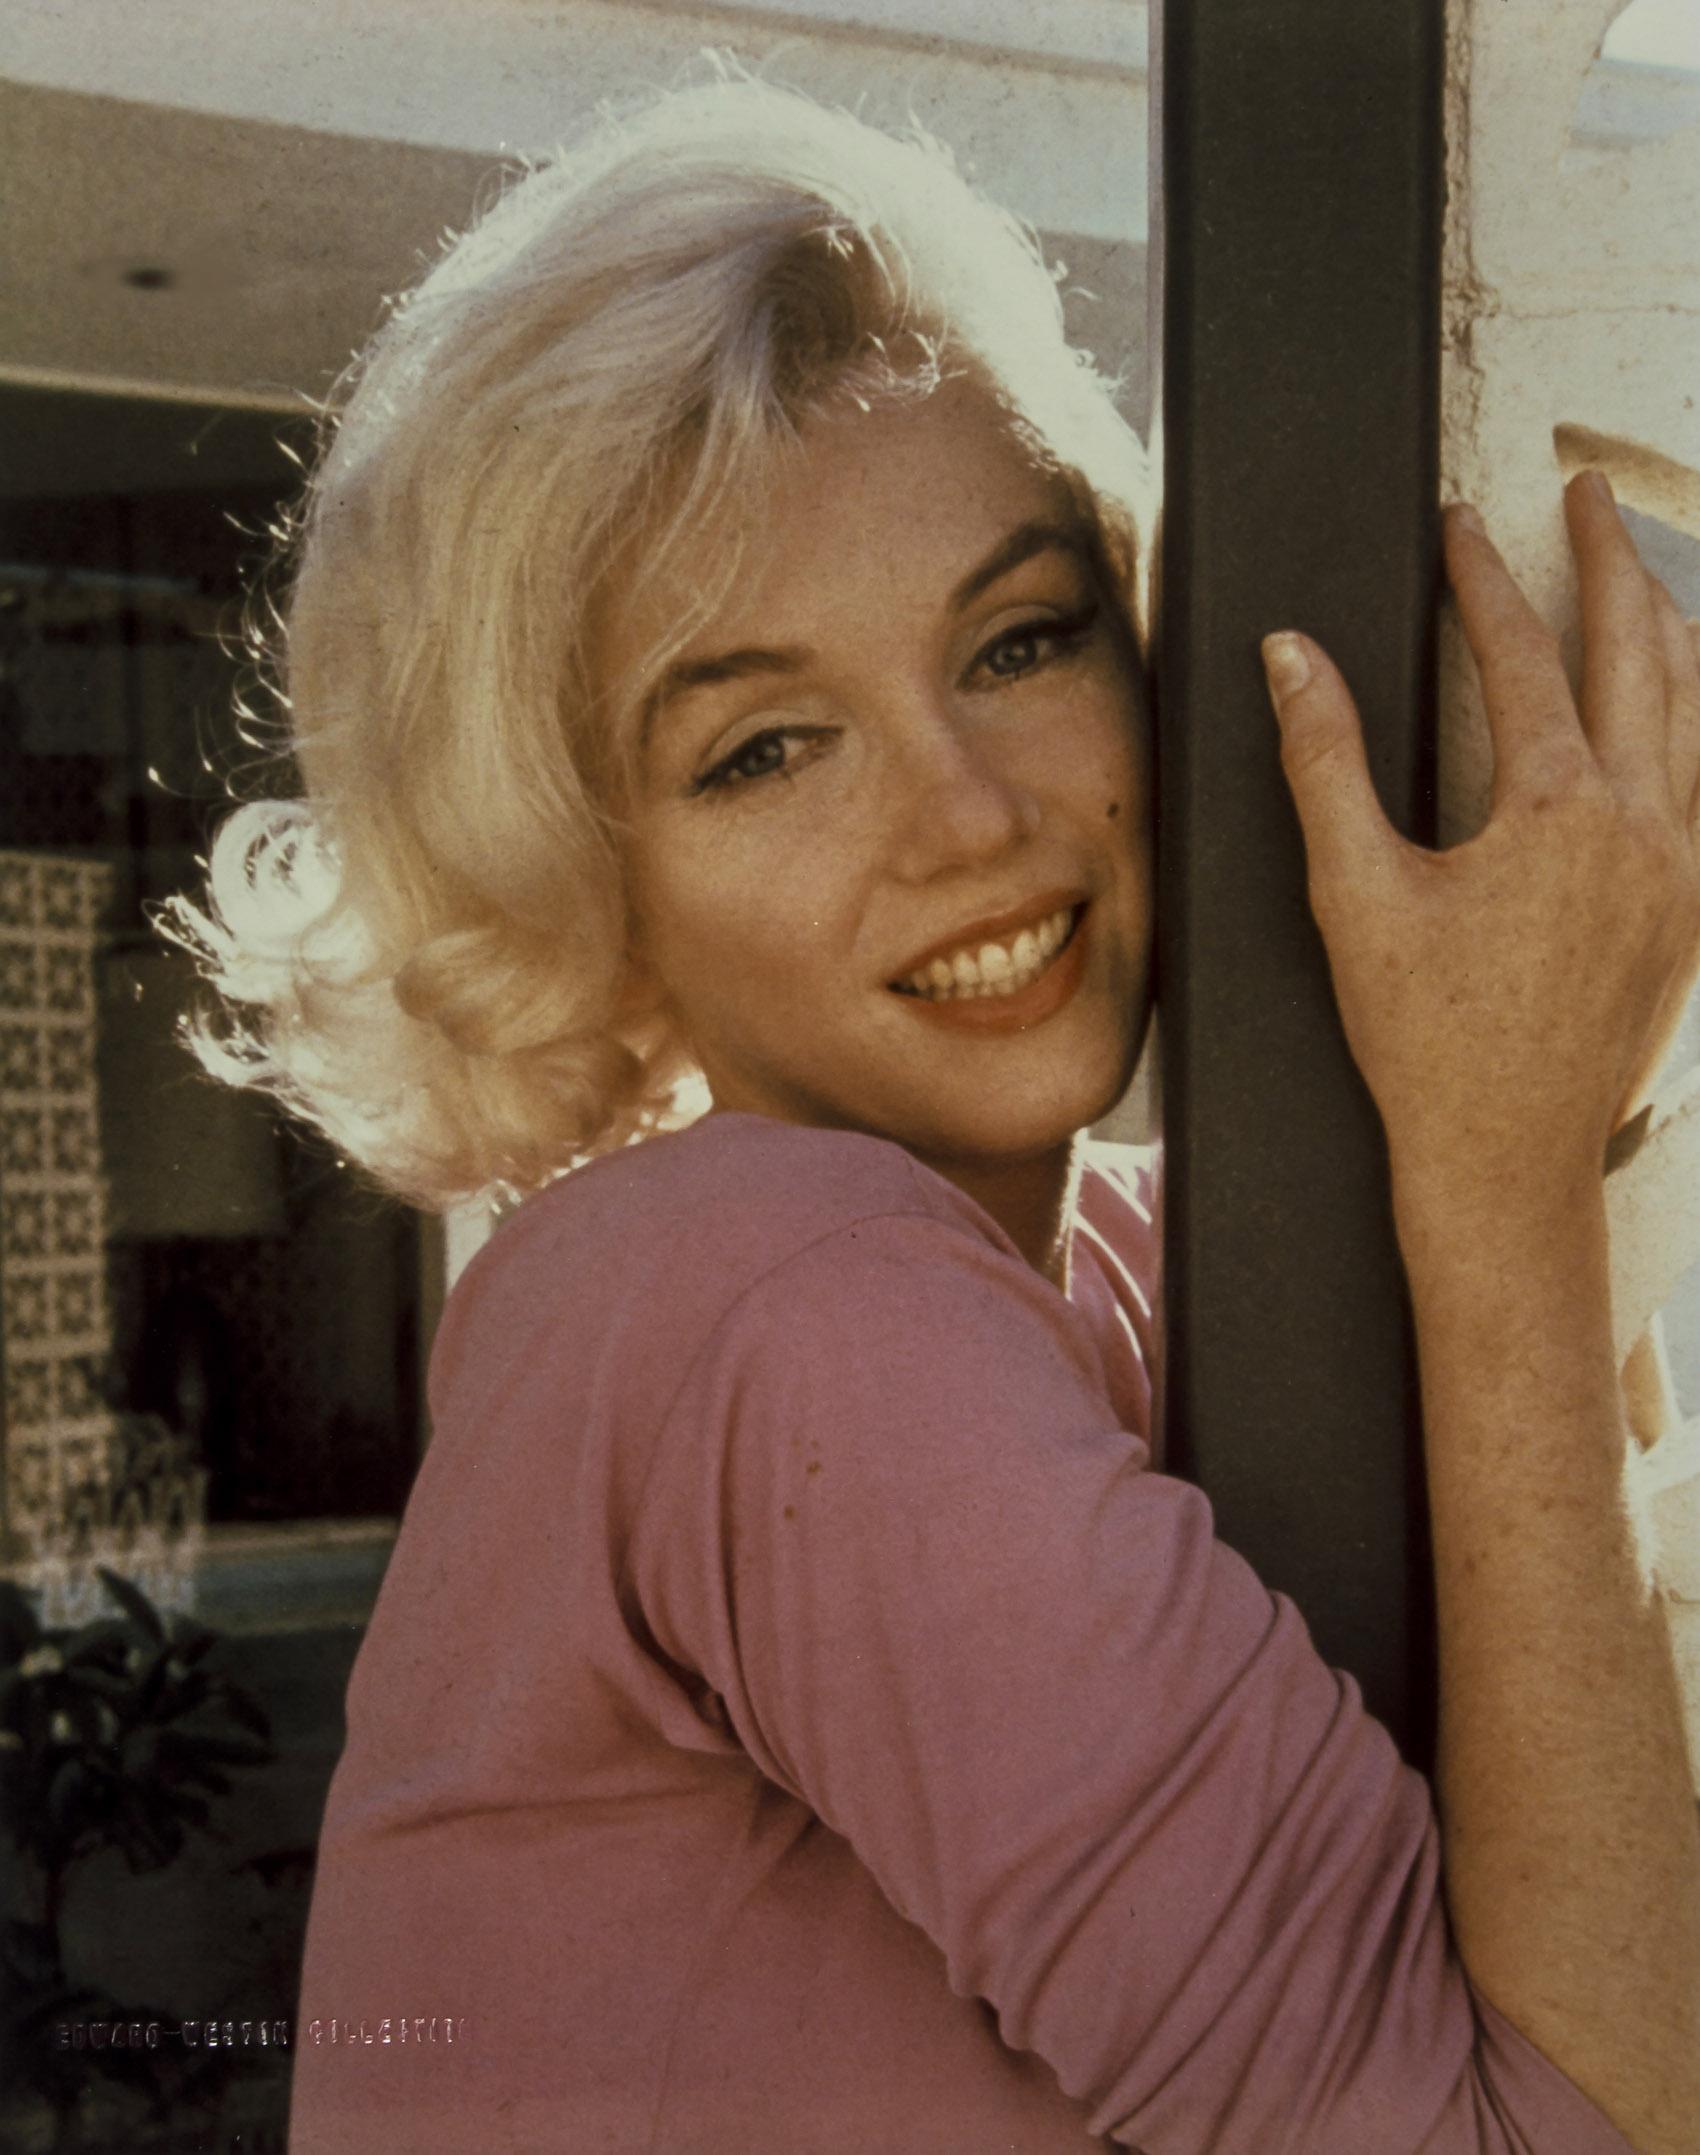 Marilyn Monroe Living Room Decor: Marilyn Monroe Did One Last Photo Shoot Before She Died